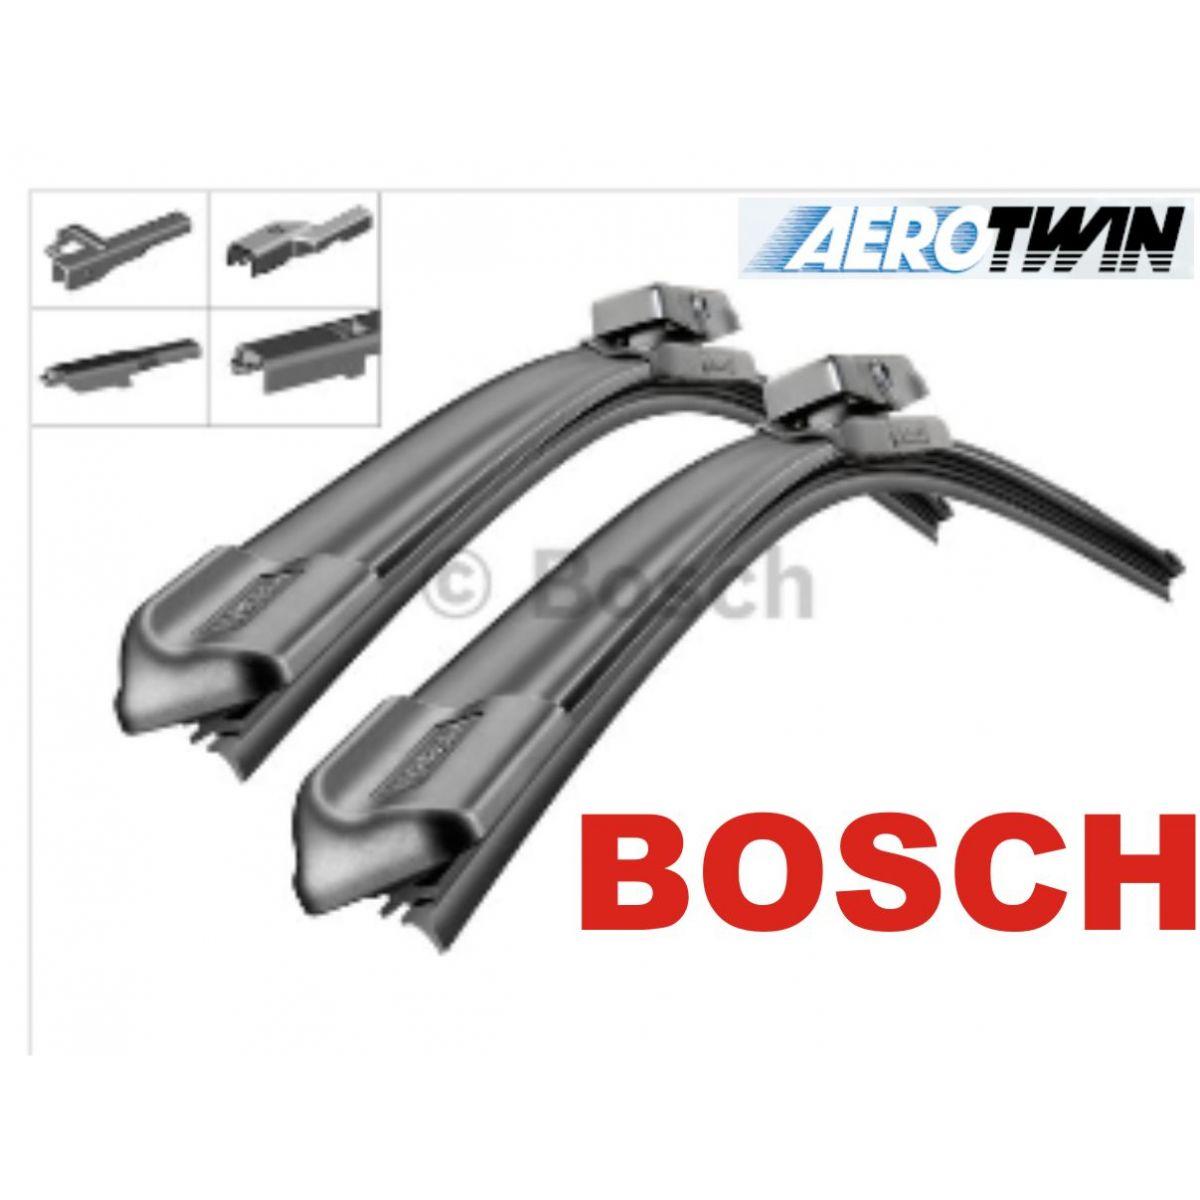 Palheta Bosch Aerotwin Plus Limpador de para brisa Bosch Smart Fortwo (451) Cabrio, Fortwo (451) Coupe